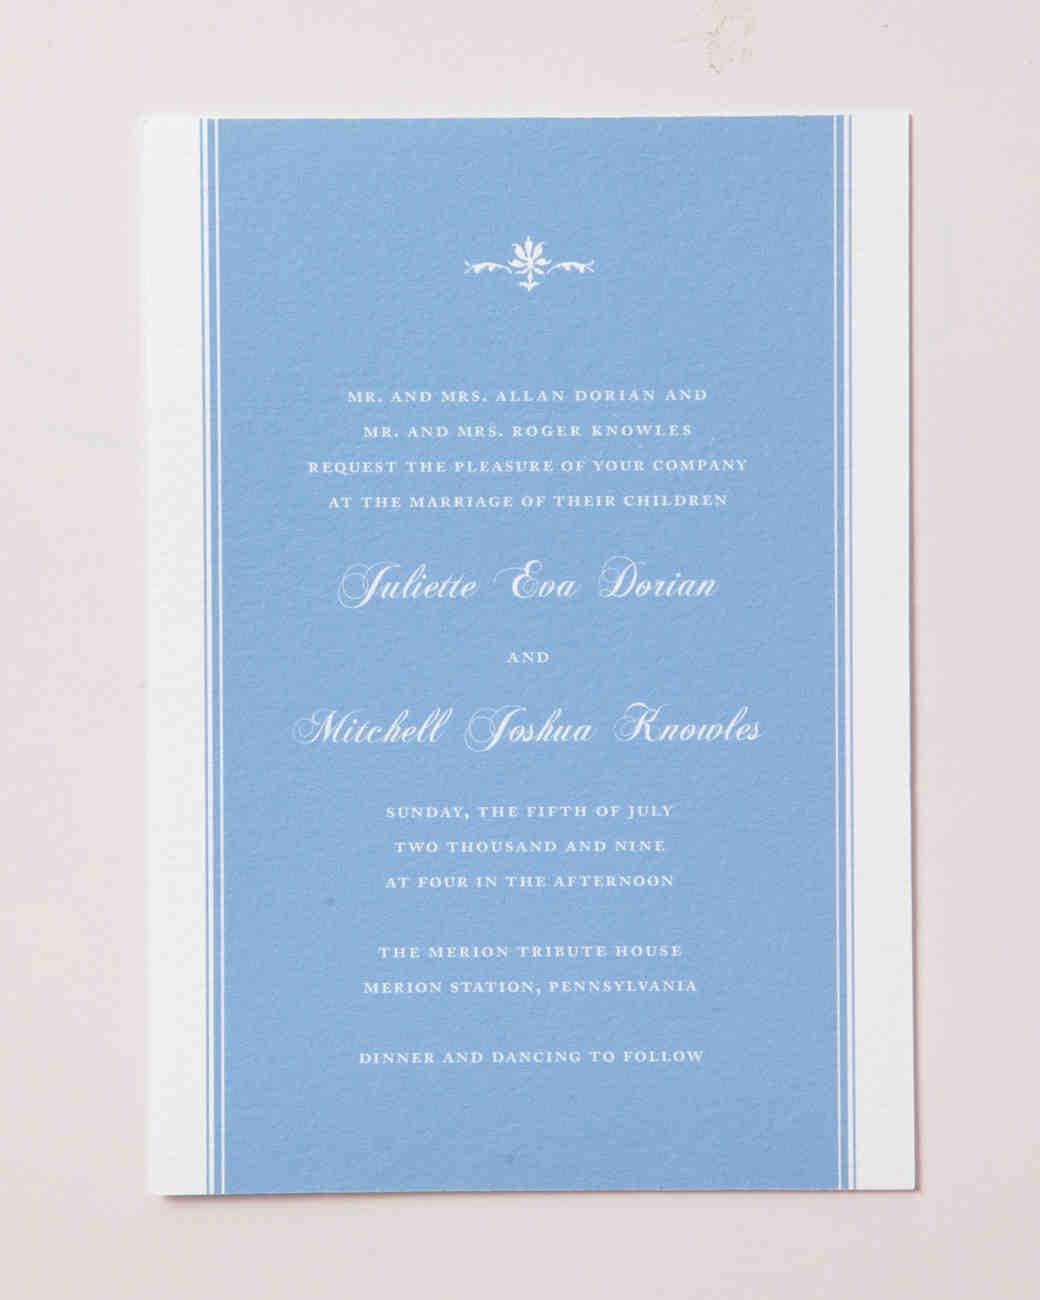 host-lines-weddings-stationery-7-both-parents-0541-d111607-1014.jpg